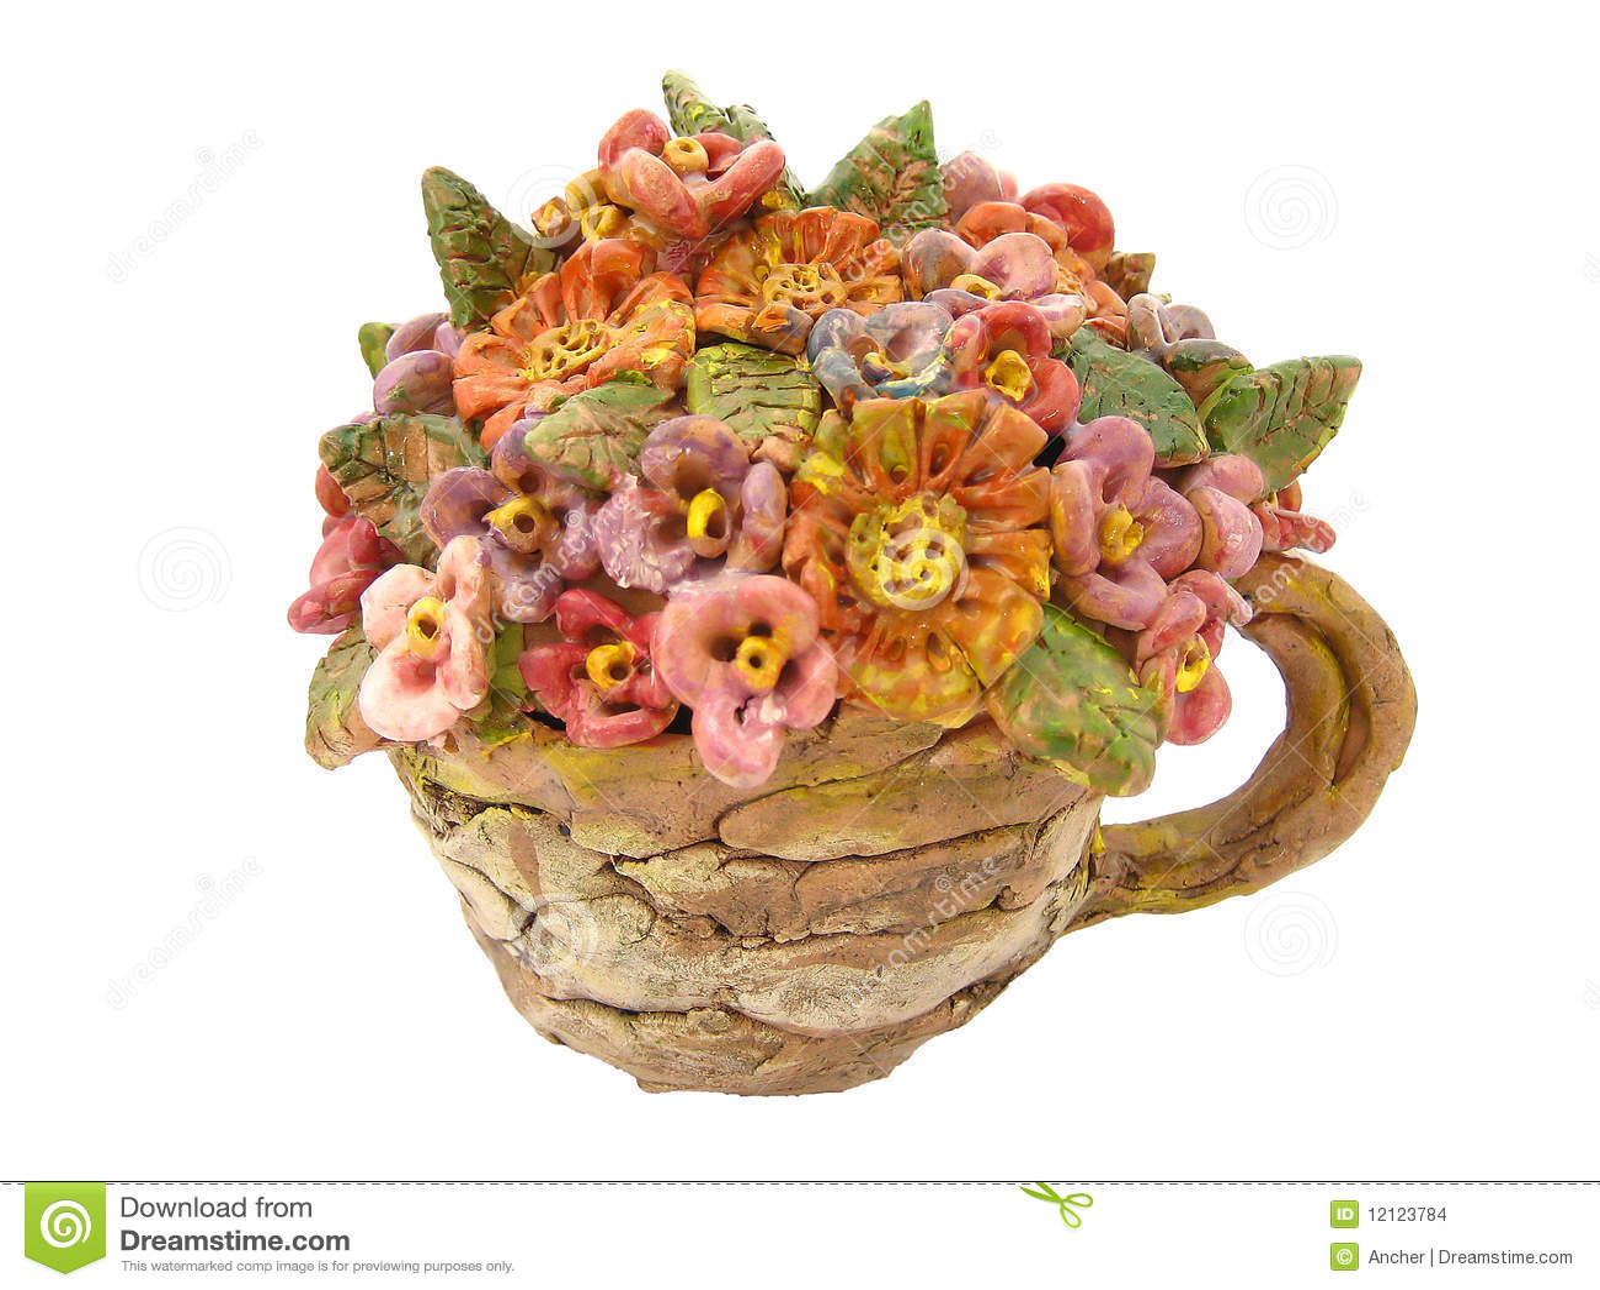 Fiori Di Ceramica.Fiori Di Ceramica Fotografia Stock Immagine Di Mano 12123784